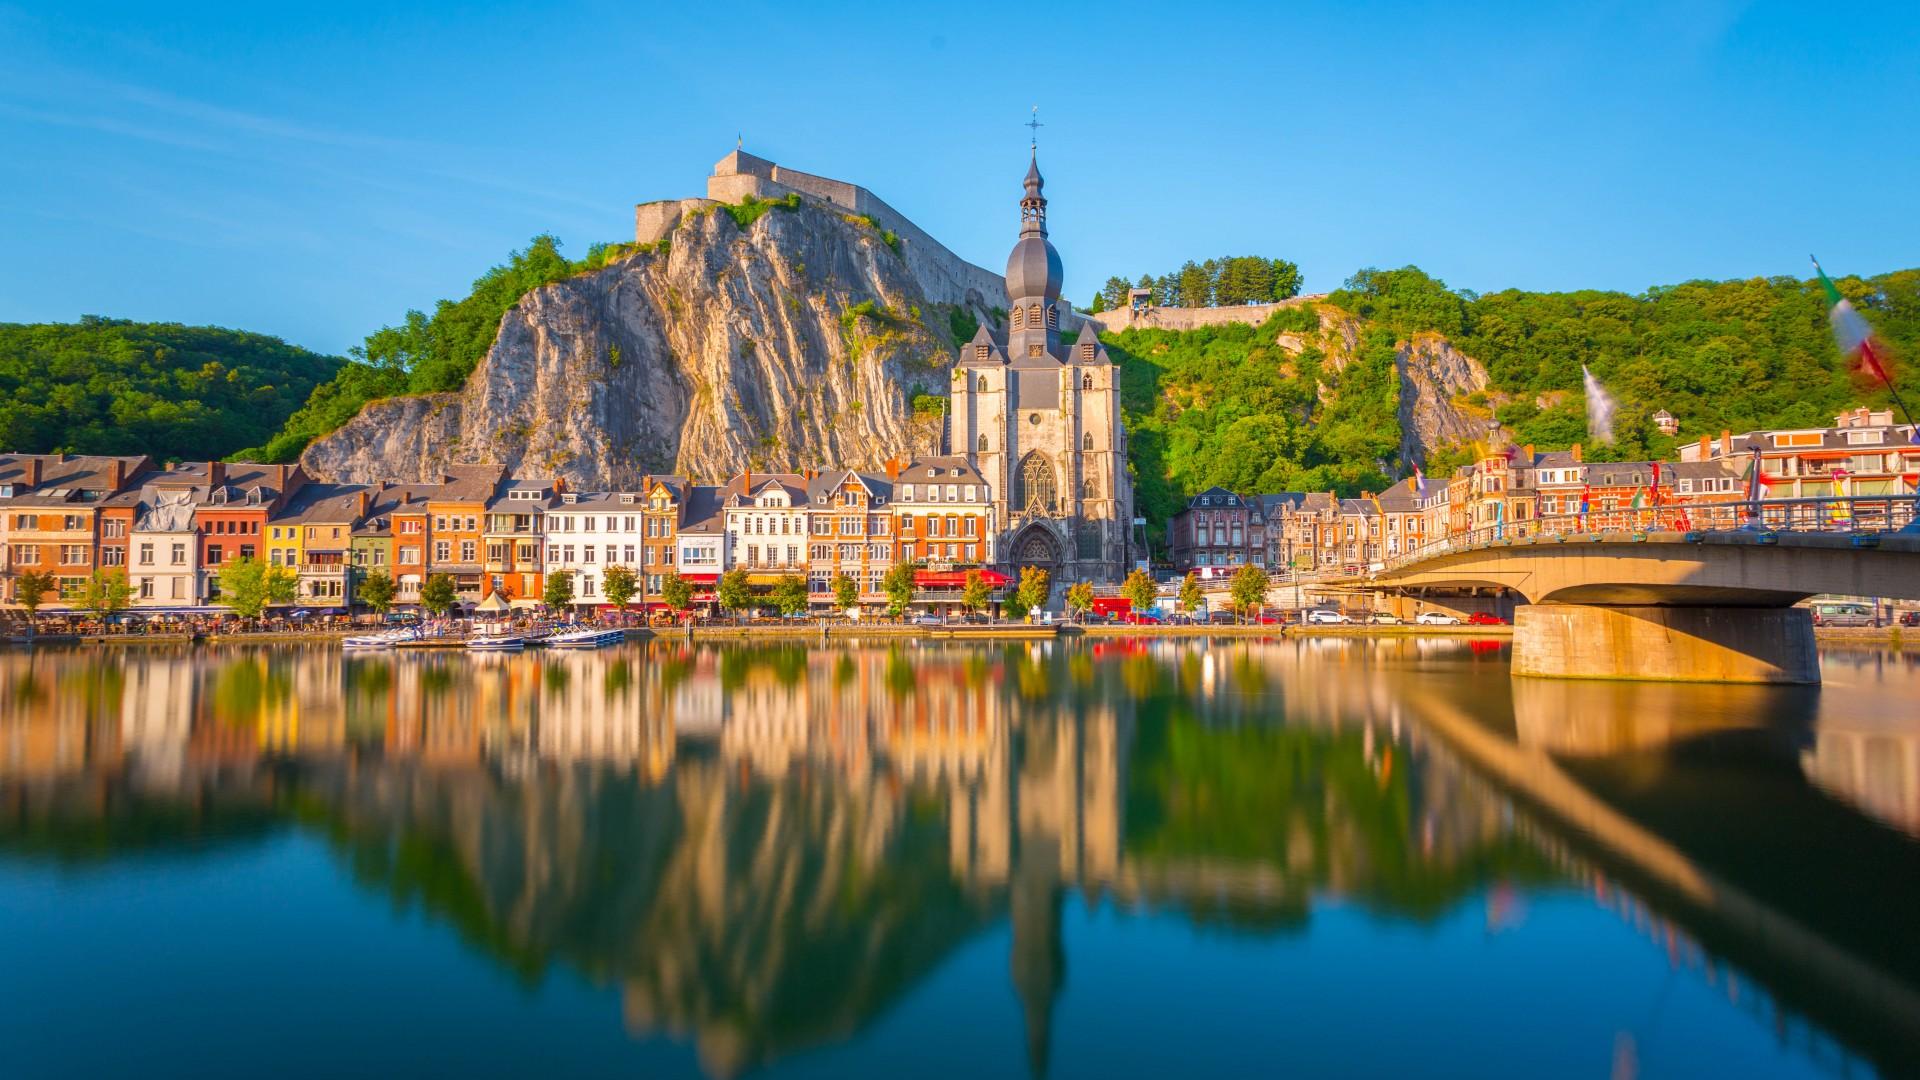 dinant-de-brug-de-gotische-kathedraal-e-secret-world